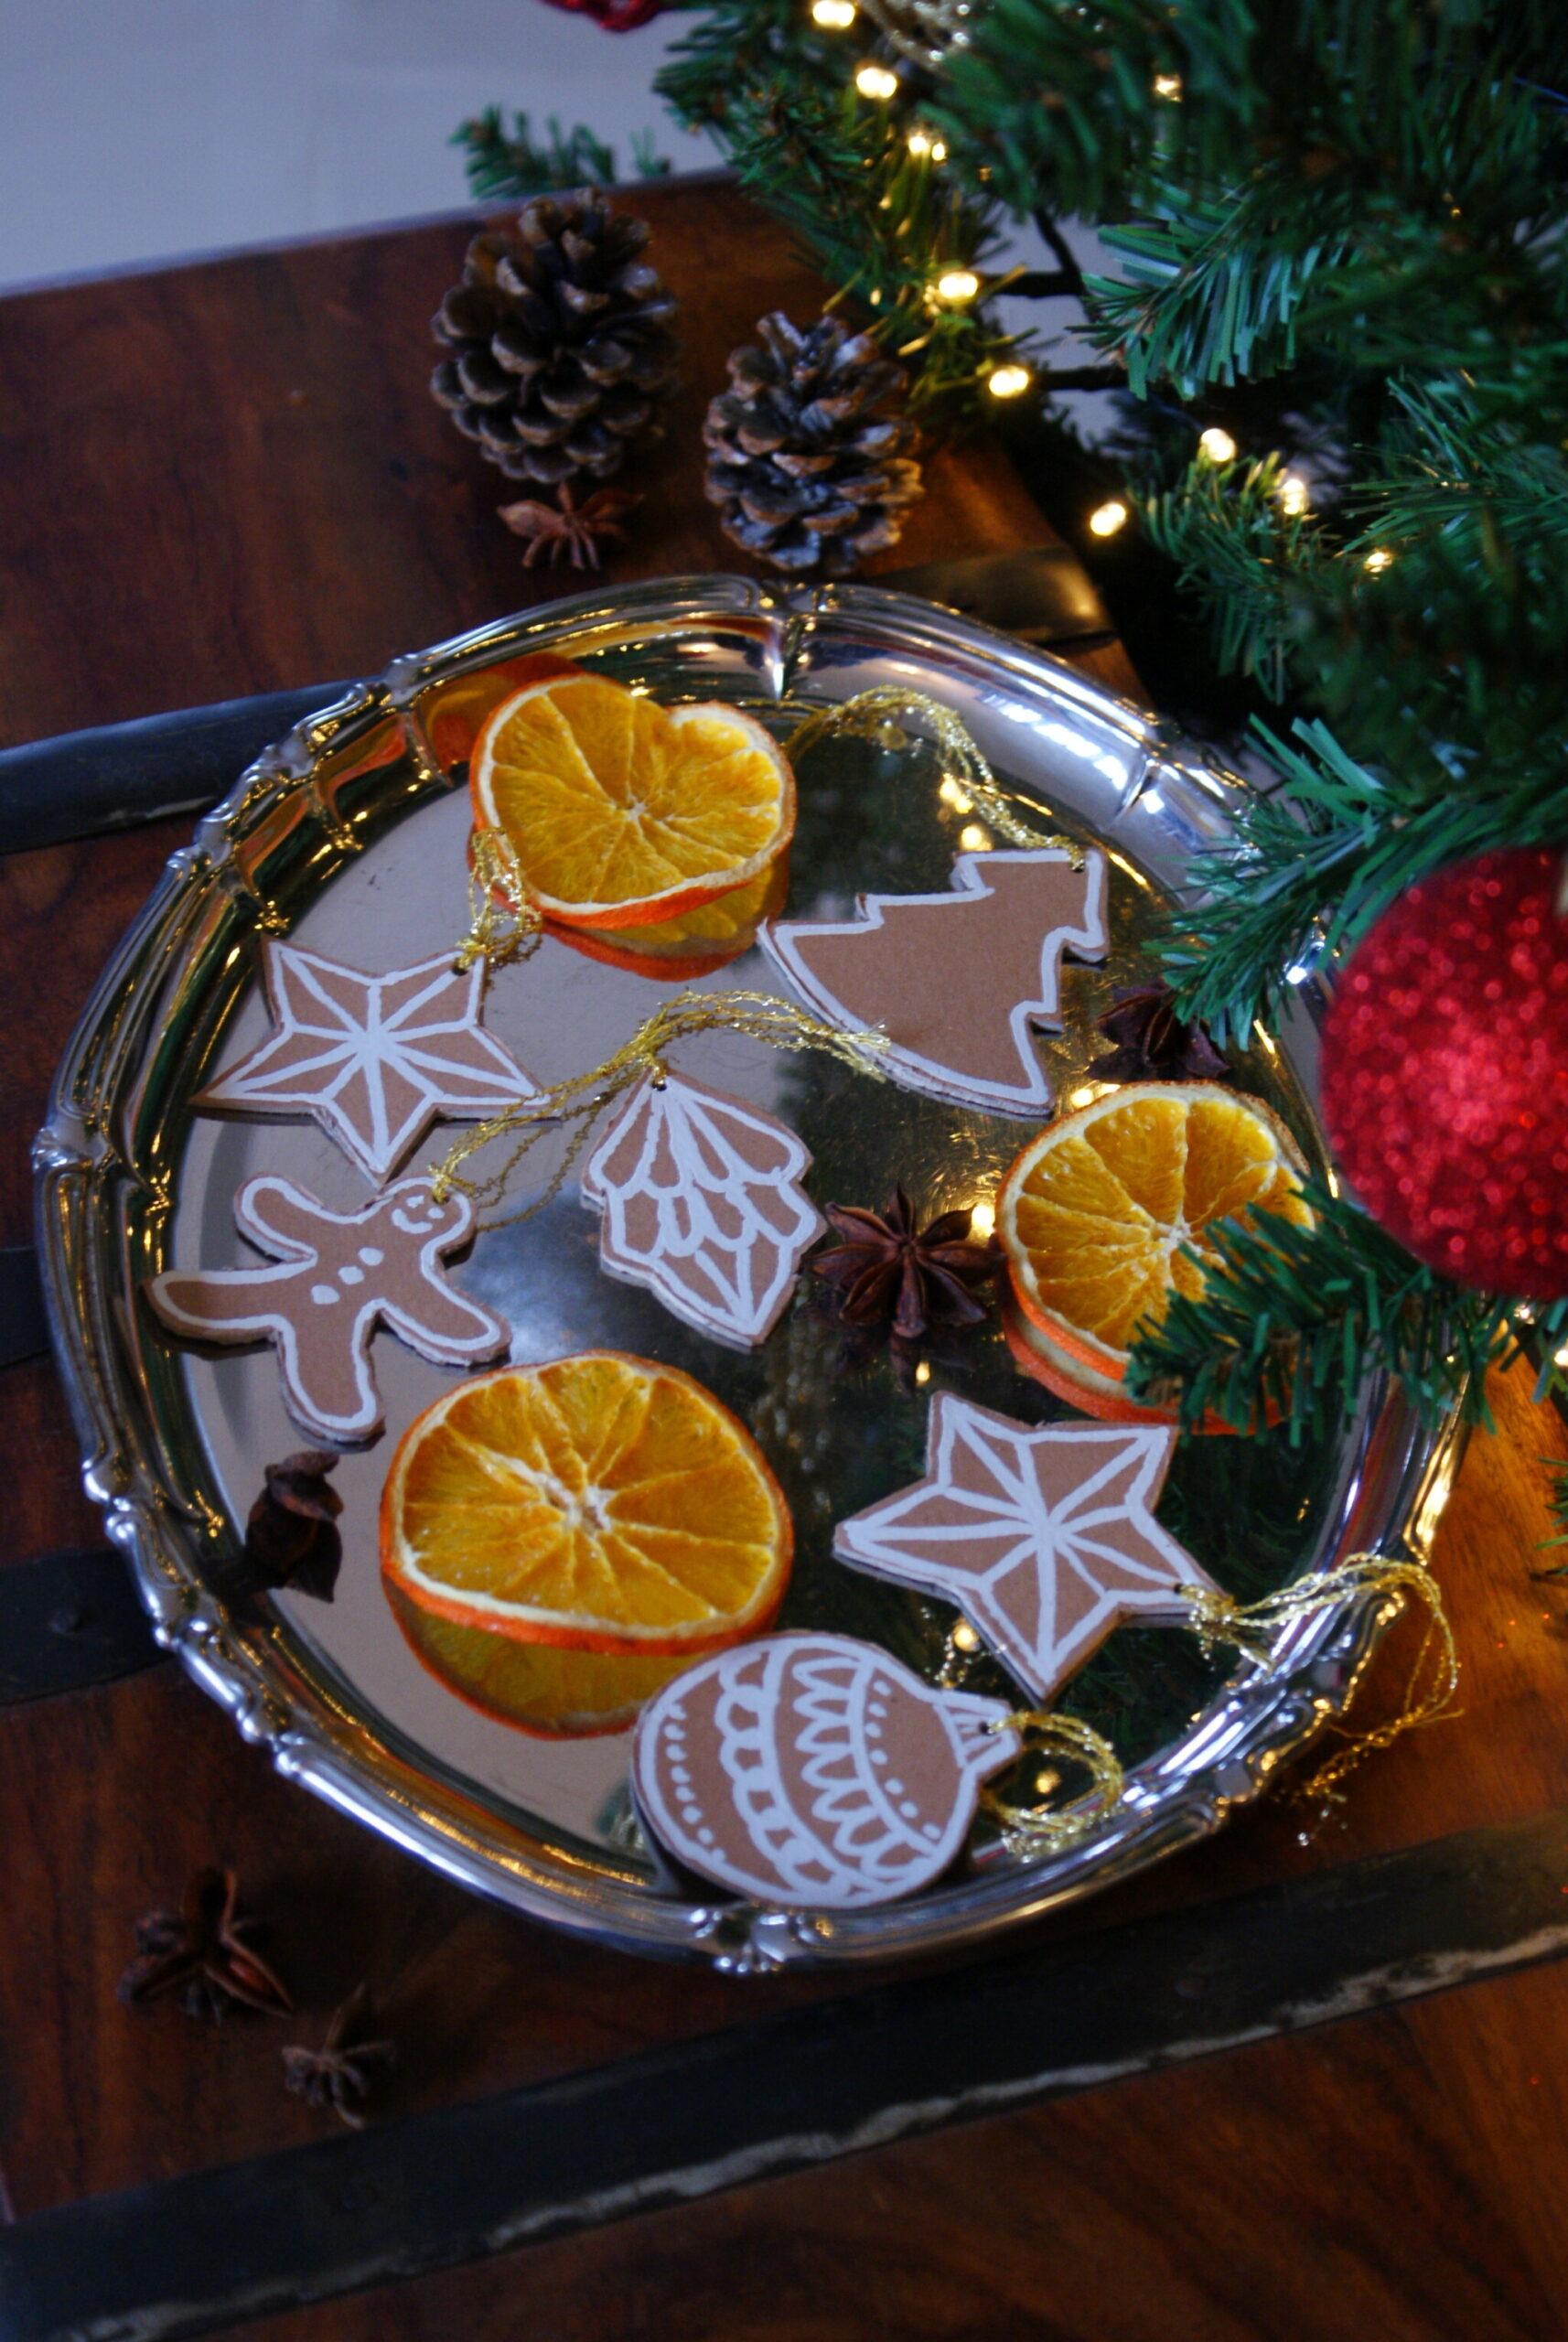 diy cardboard gingerbread cookies christmas tree ornaments idea easy last minute francinesplaceblog craft decorations